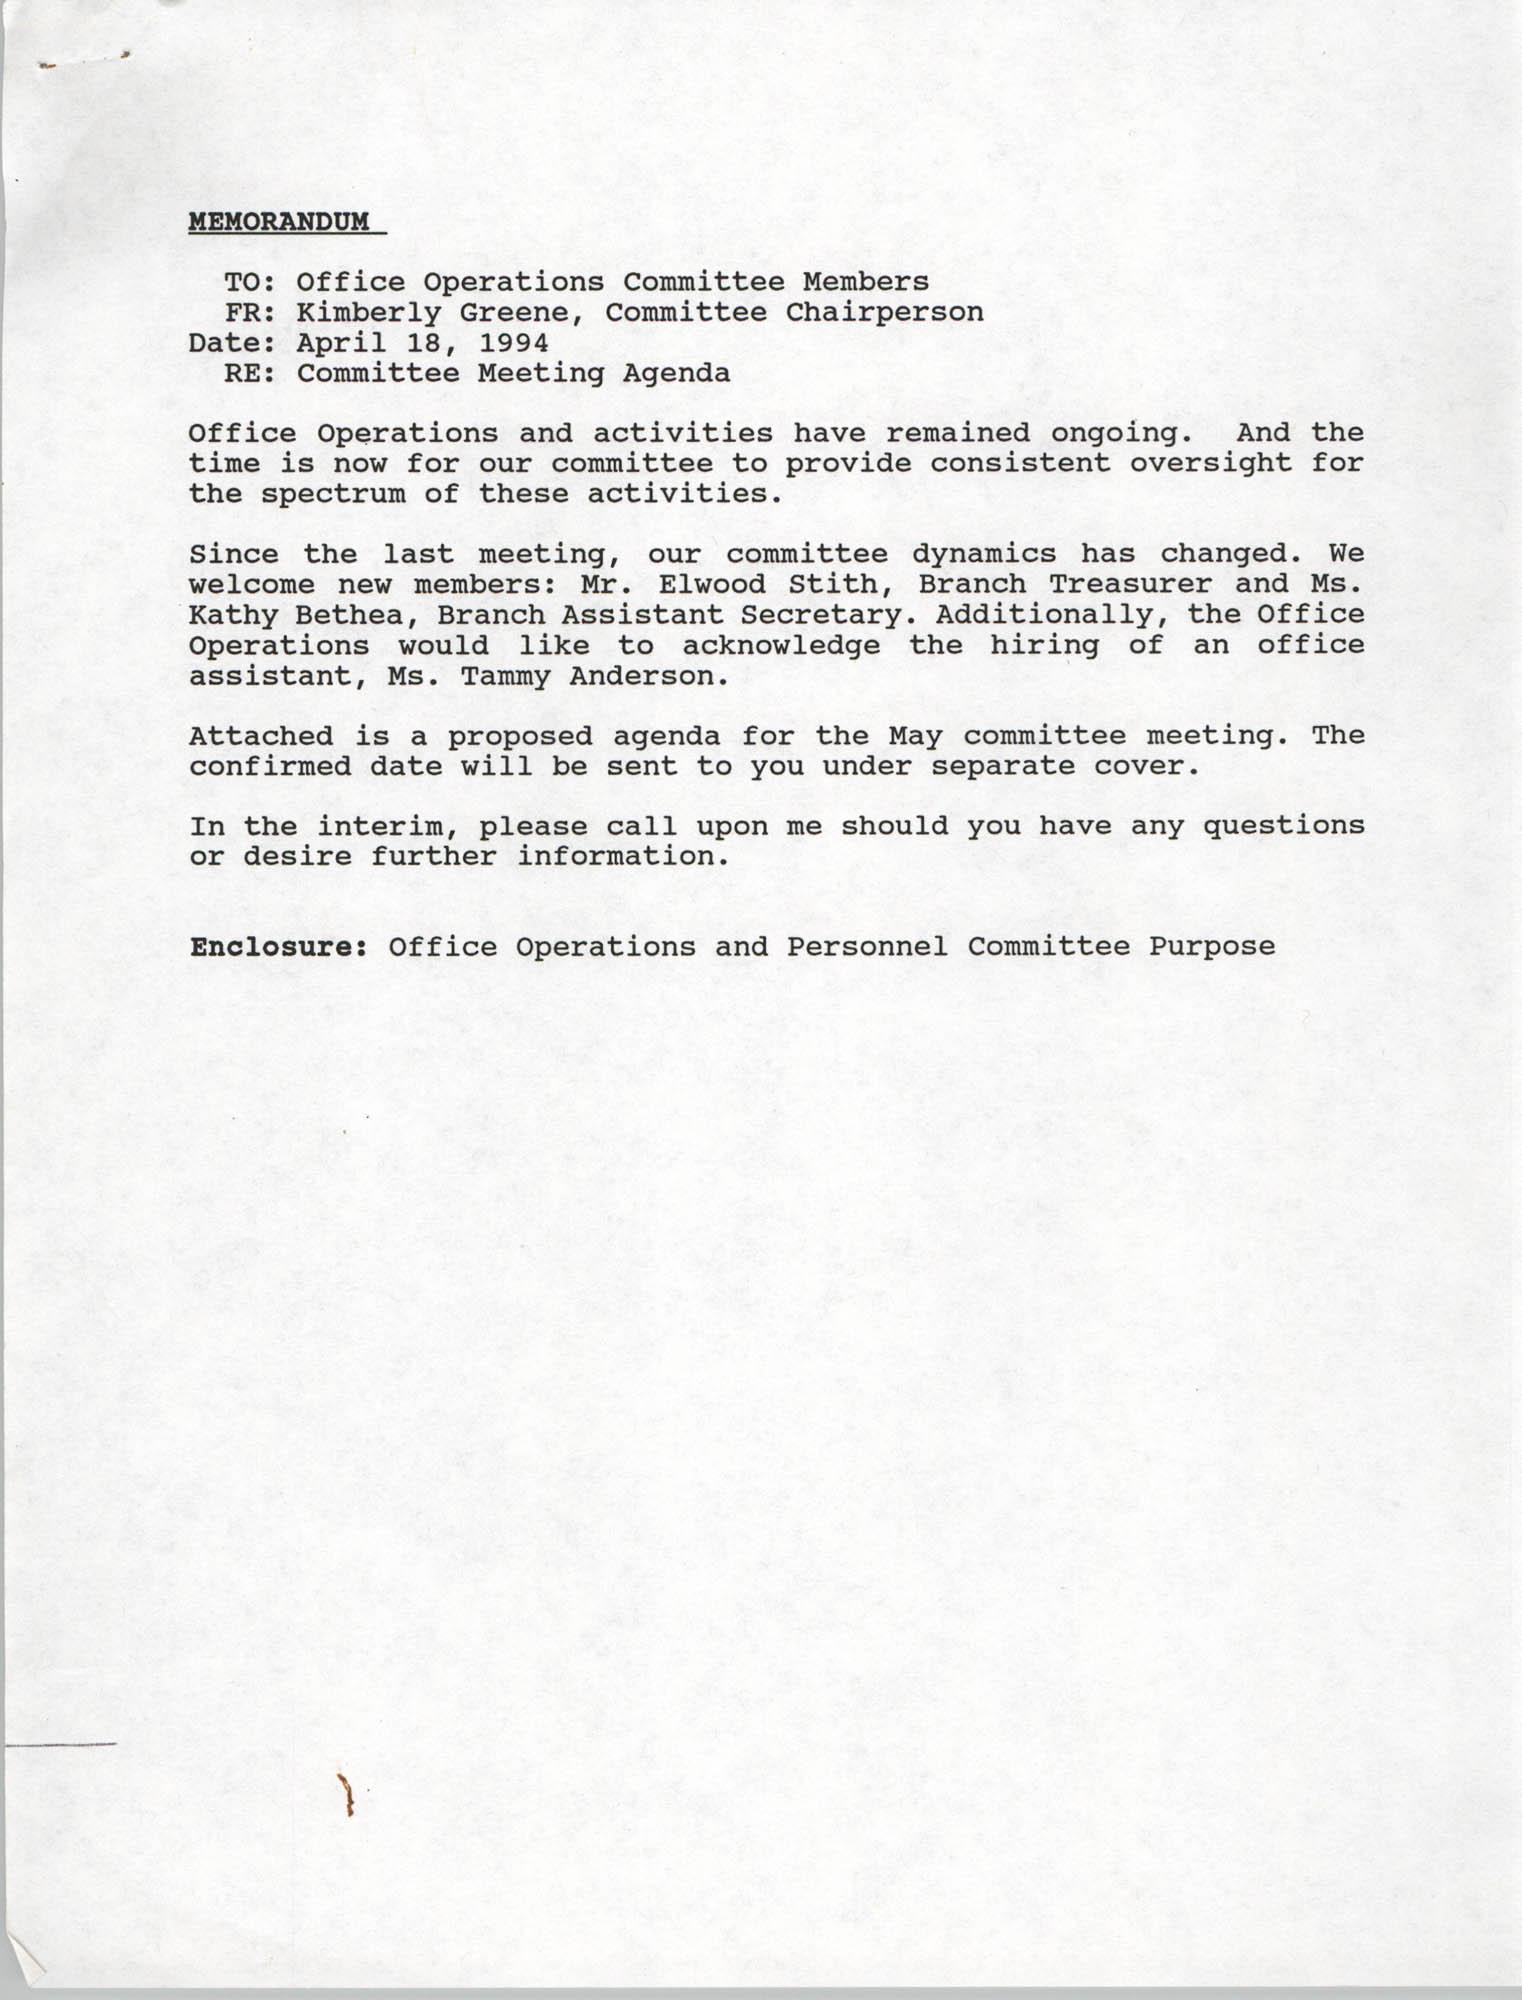 Charleston Branch of the NAACP Memorandum, April 18, 1994